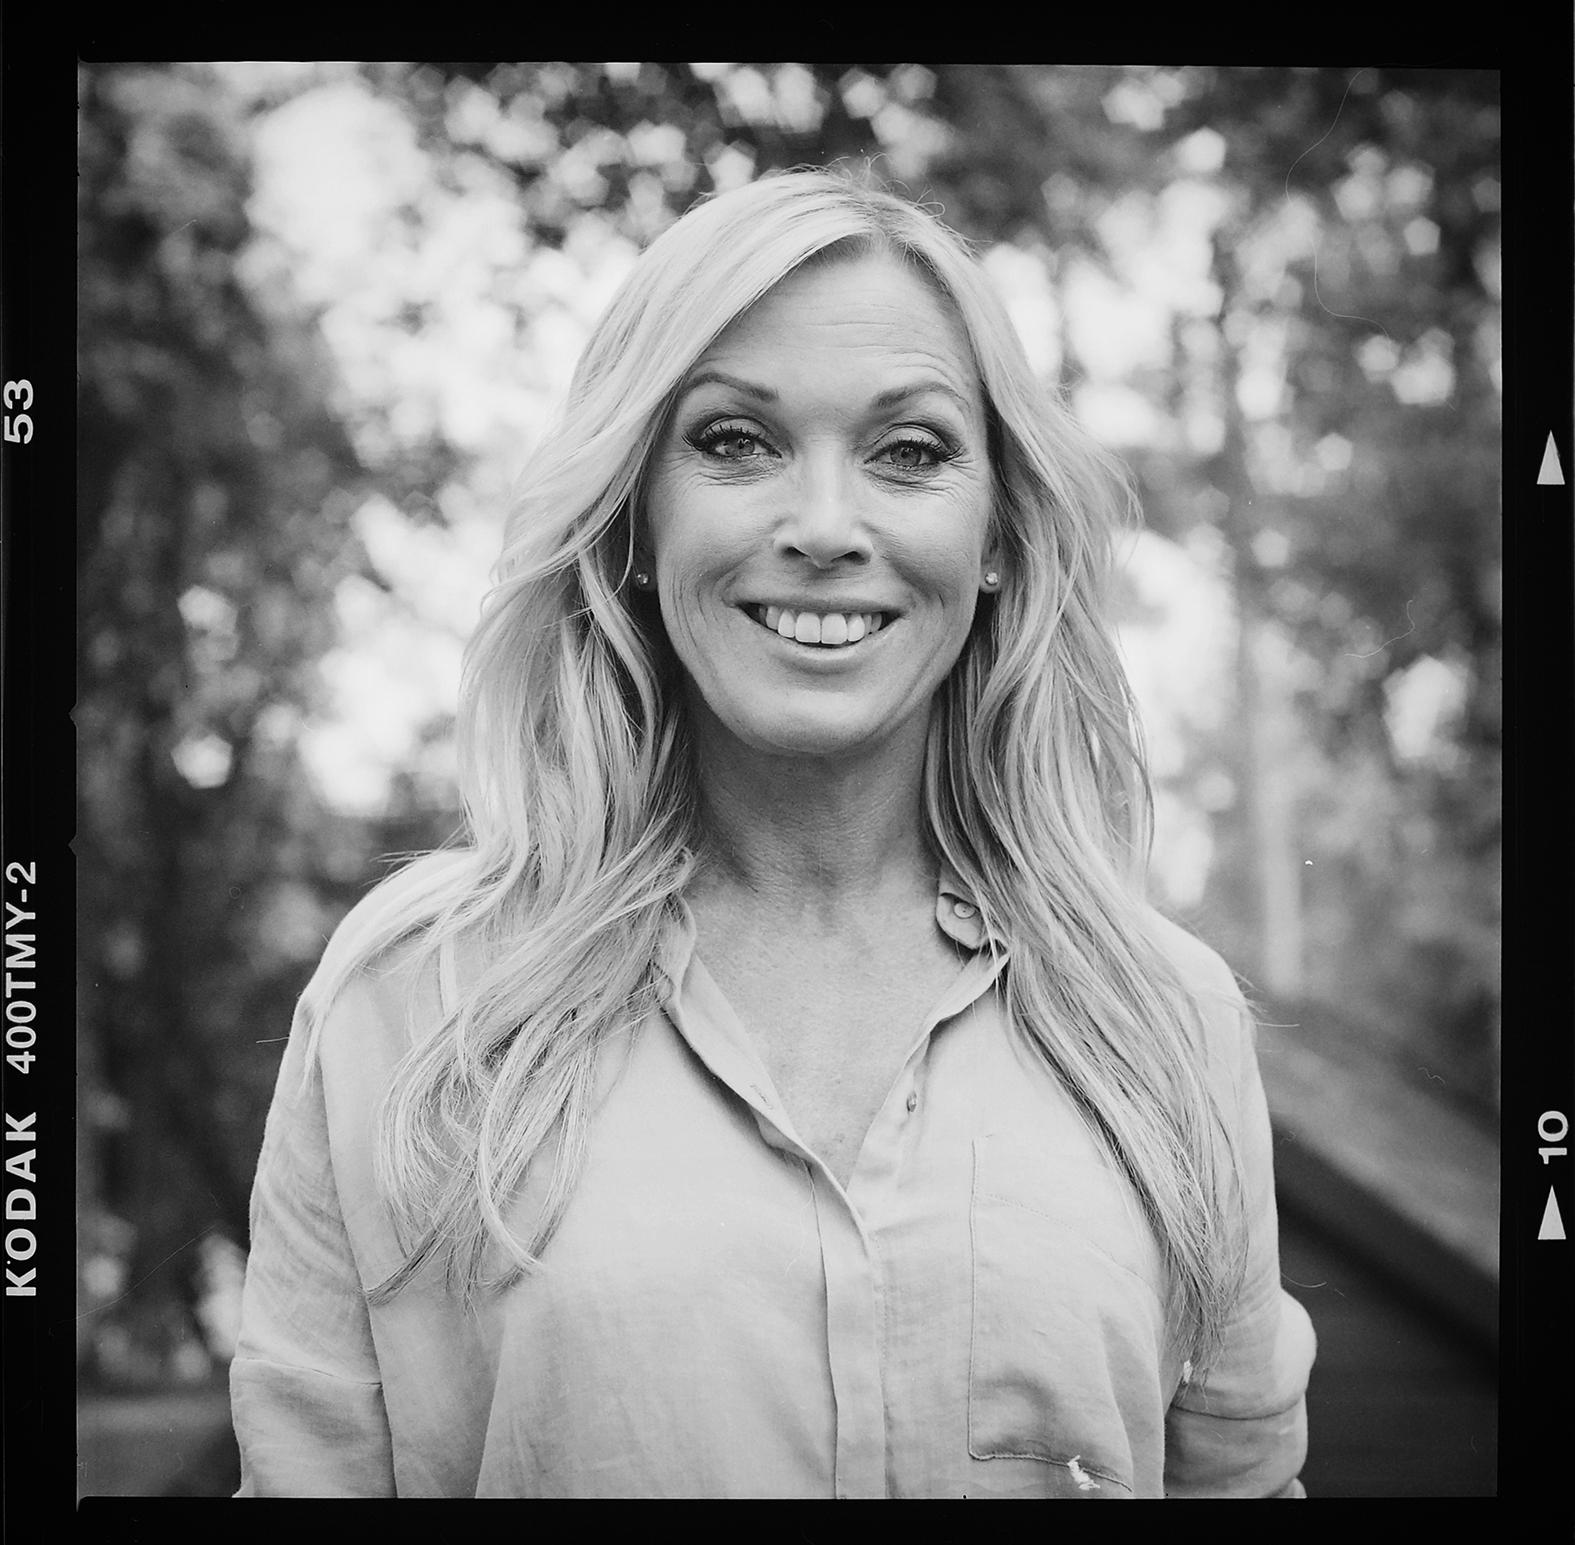 Programledaren för Bonde söker fru, Linda Lindorff. Foto: Mikael Andersson, 2016-06-01, Hasselblad 500 cm, 150 mm, f8-1/250 sek.